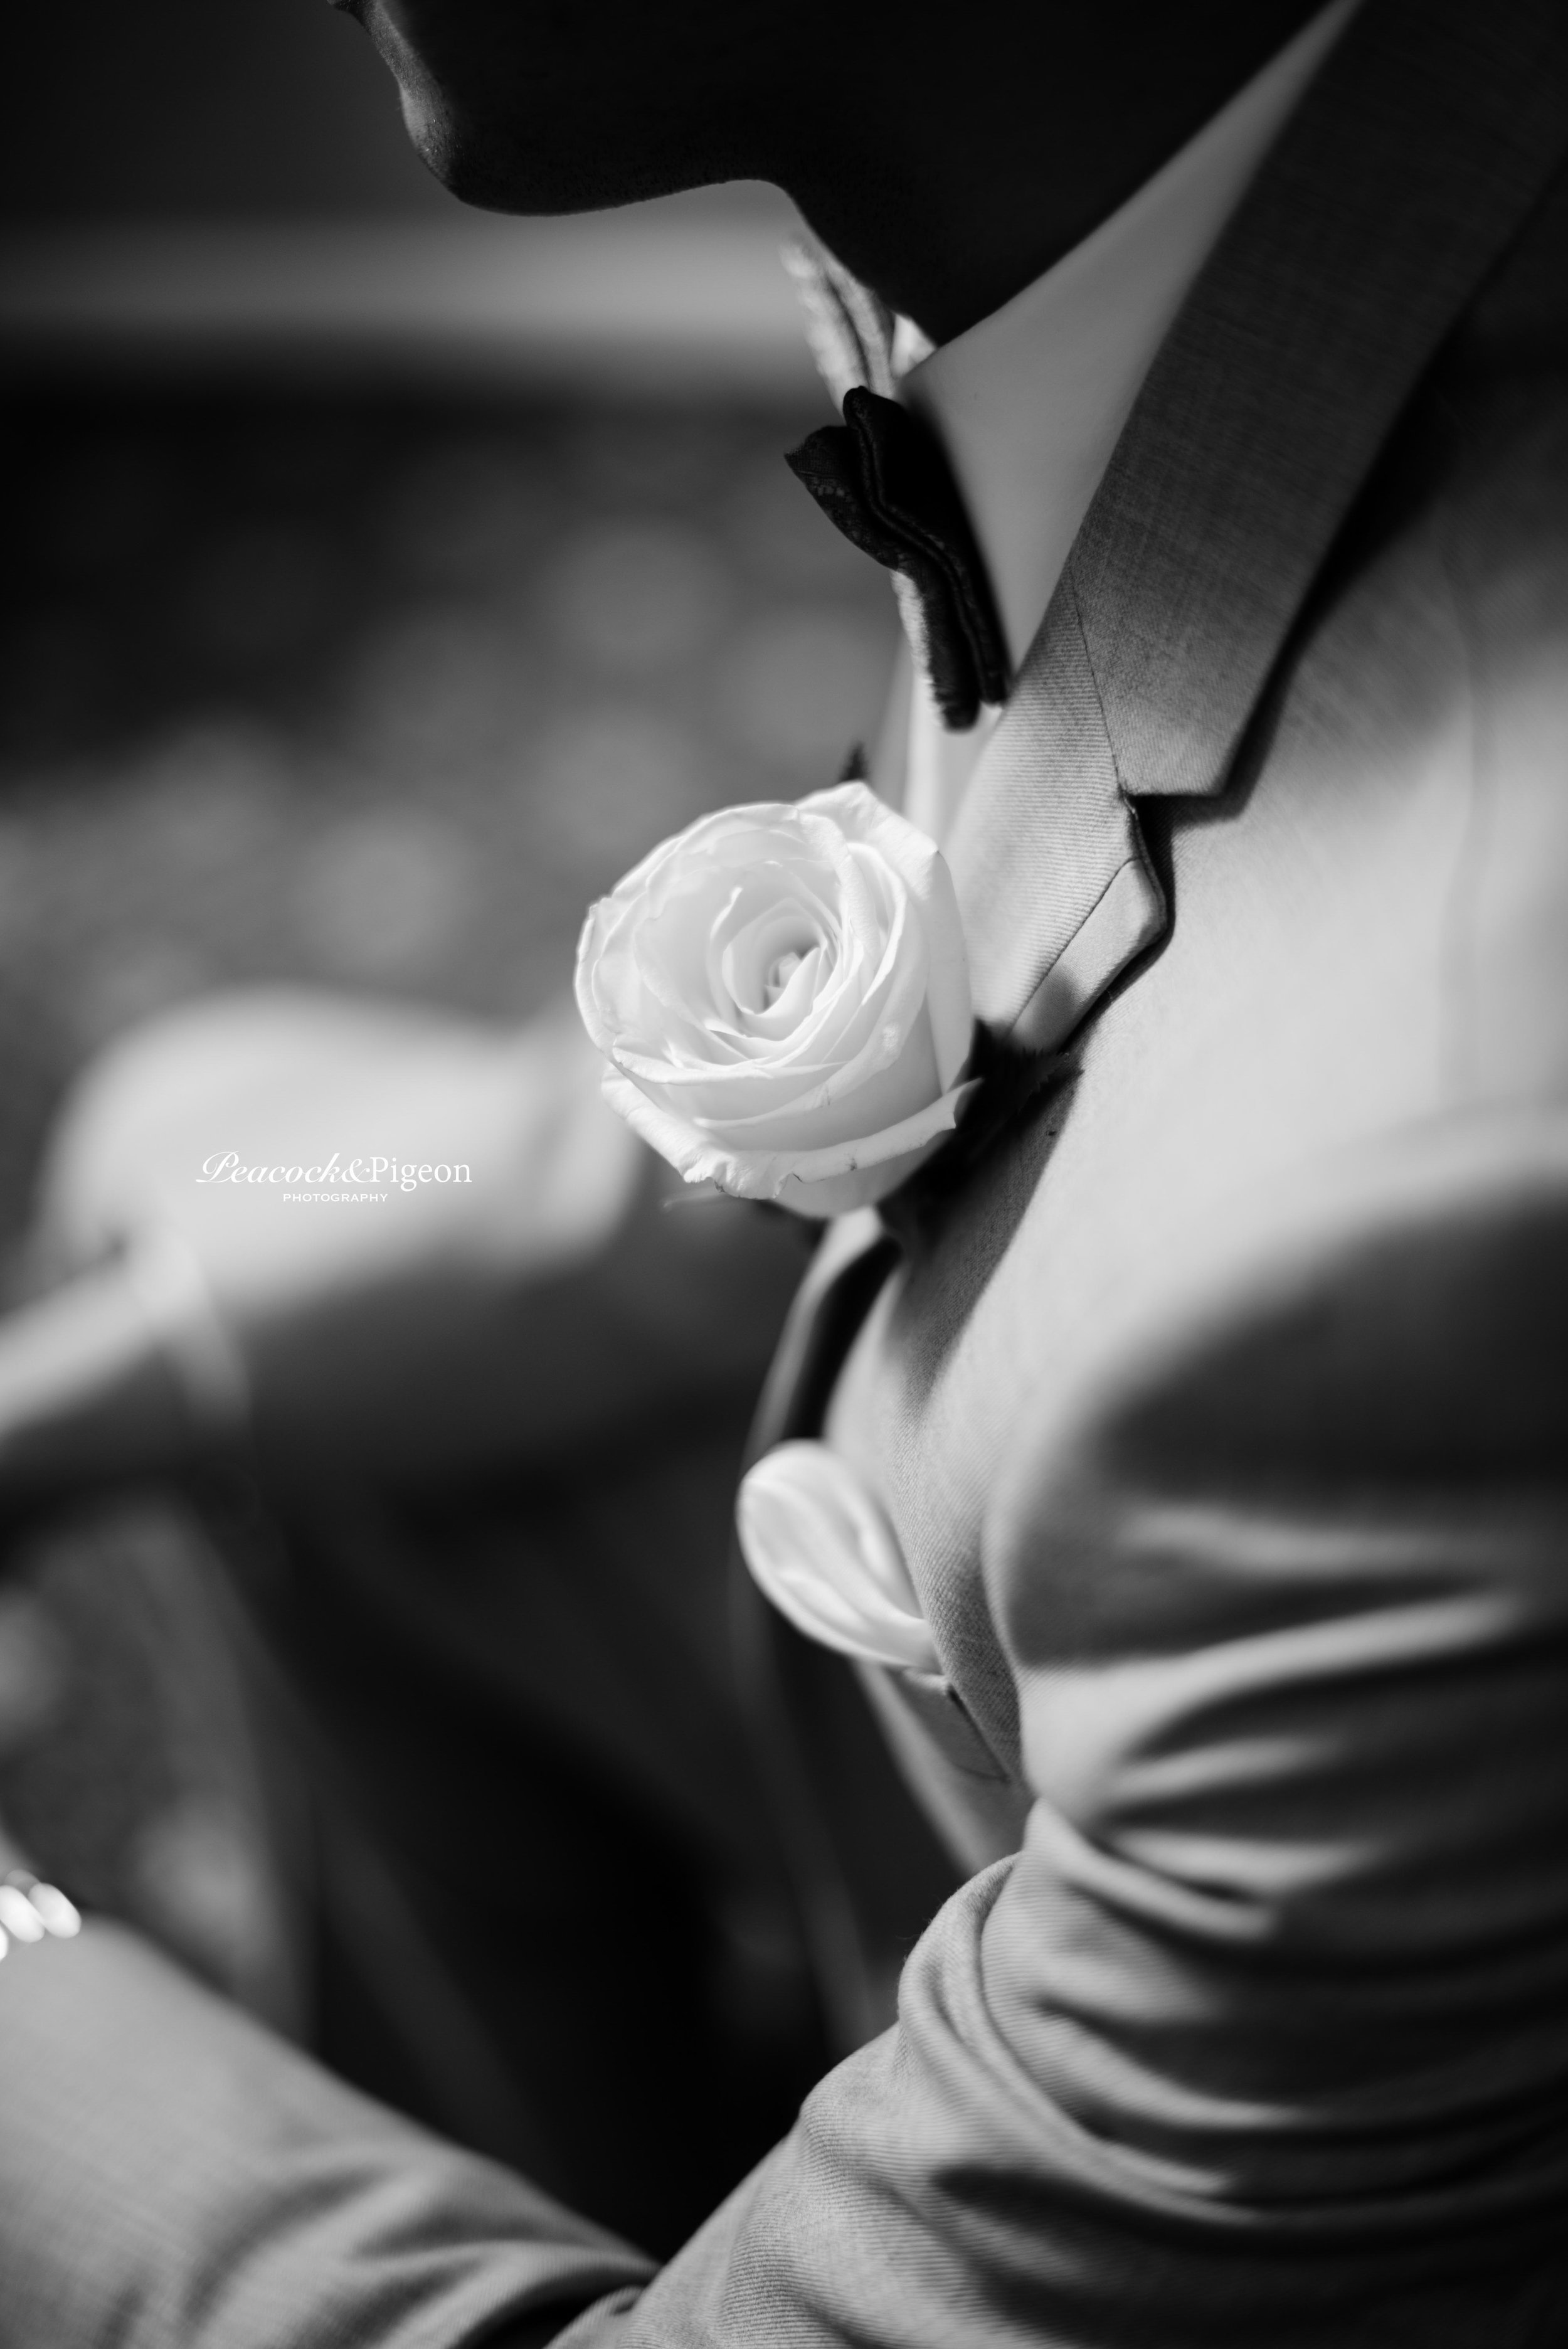 The_Wedding_of_Radwa_and_Kareem_at_Somerset_Palace_Part_Three_Kareem_and_Radwa_Portraits_Black_and_White-Watermarked-31.jpg